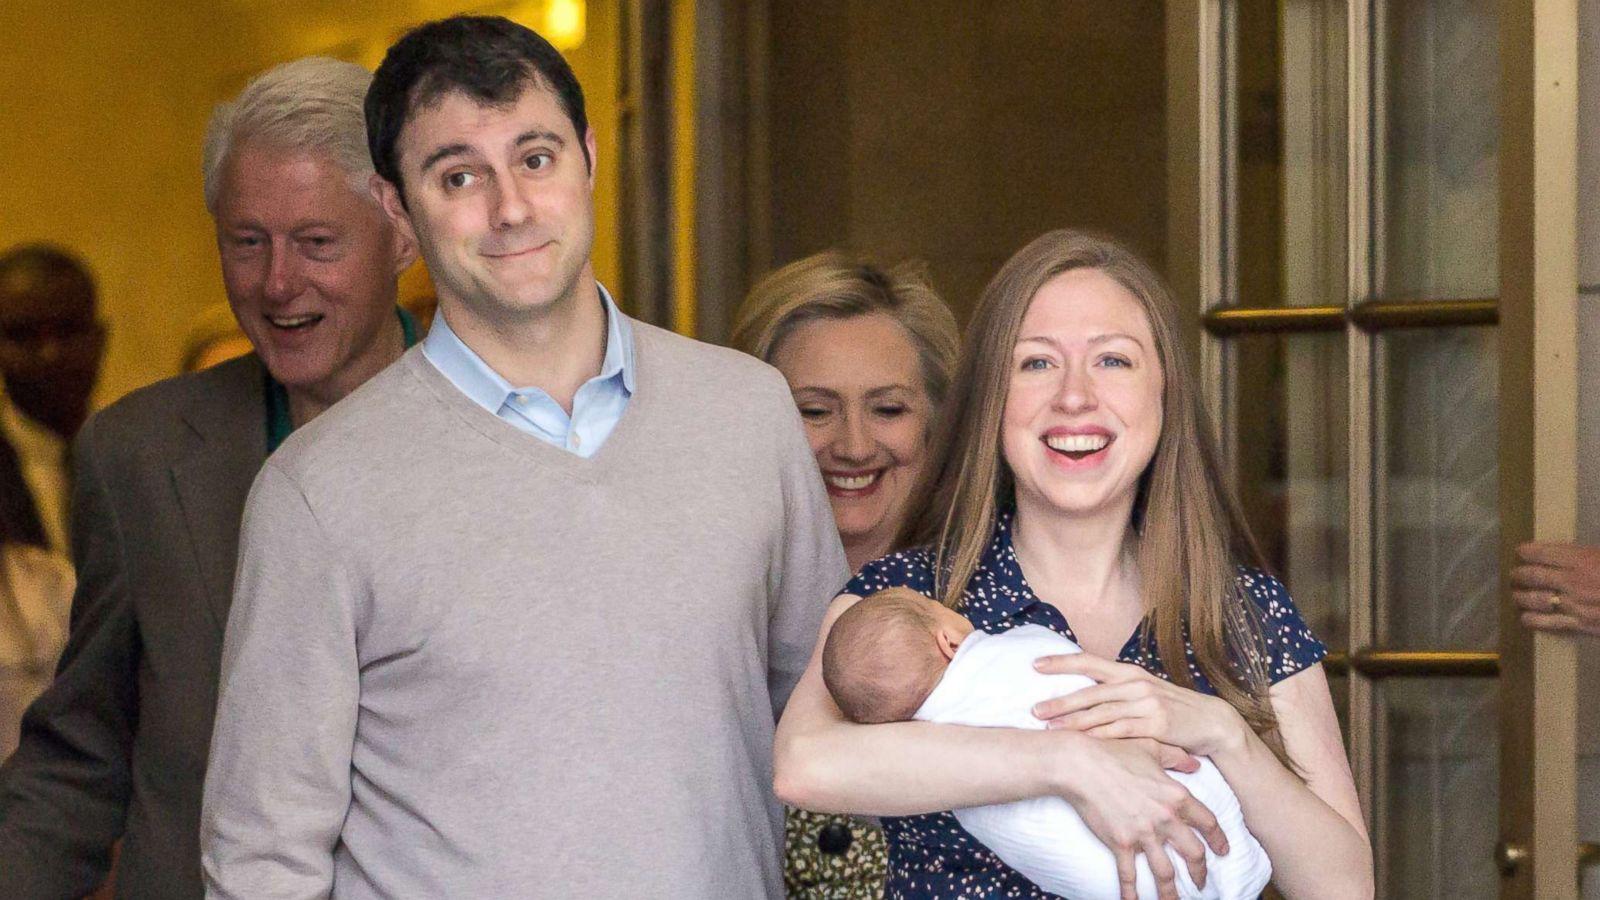 Chelsea Clinton announces that she's having a 3rd baby - ABC News